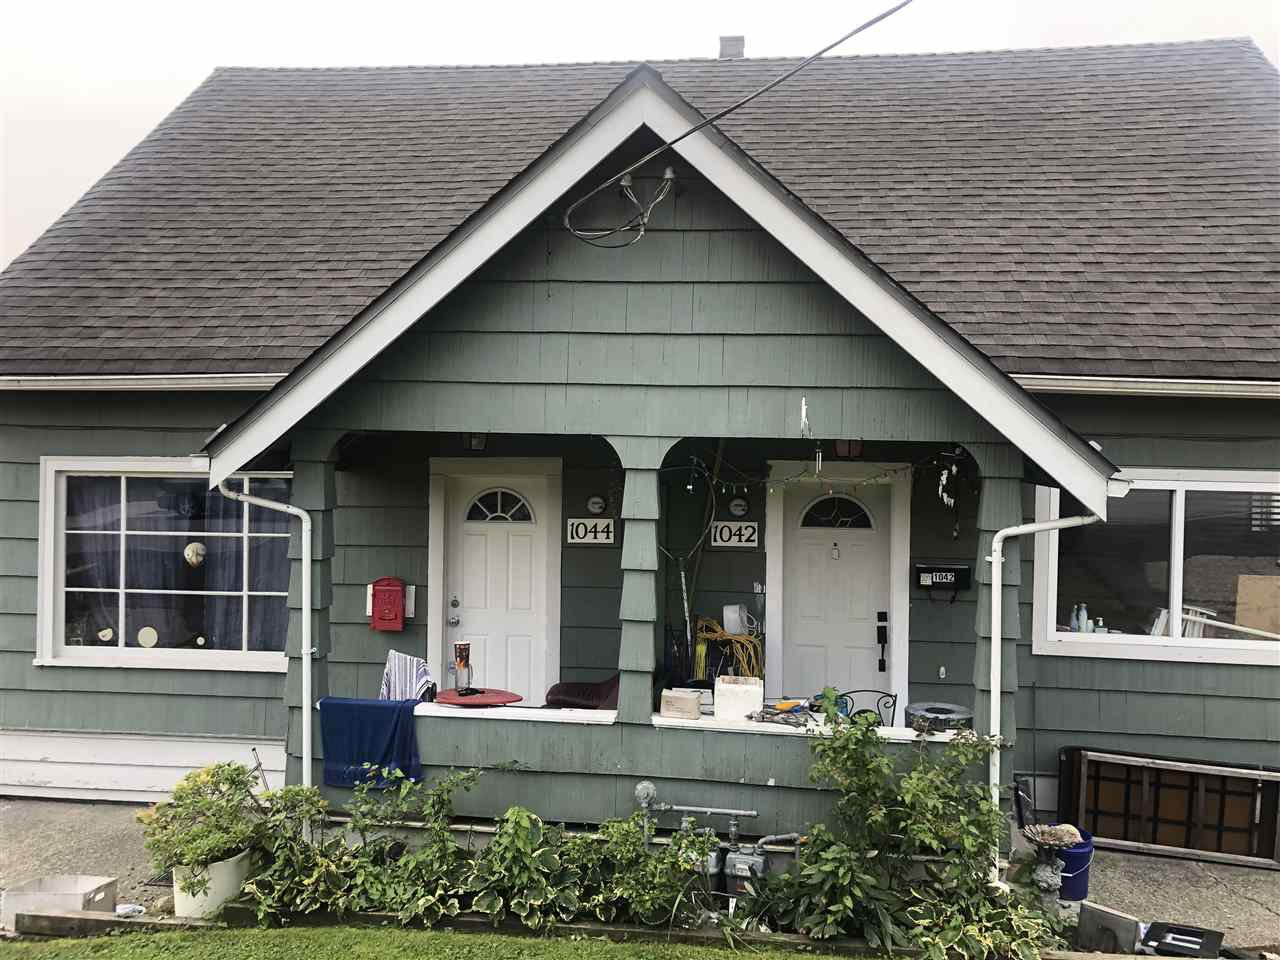 Main Photo: 1042 DELESTRE Avenue in Coquitlam: Maillardville Duplex for sale : MLS®# R2505087